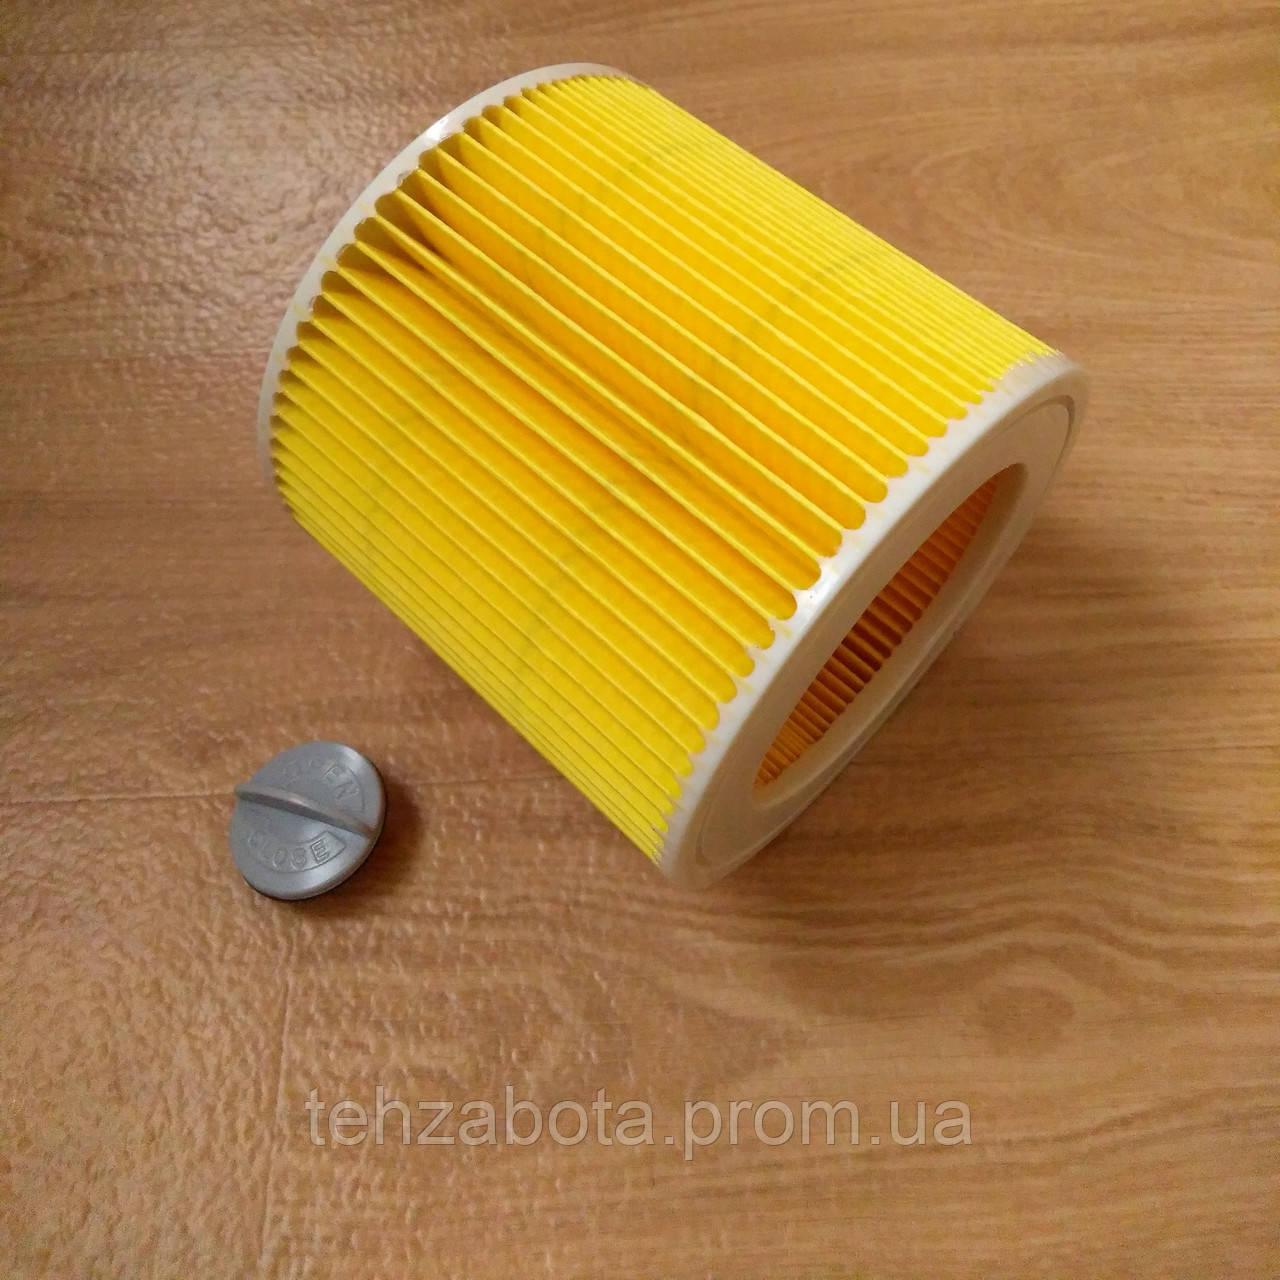 патронный фильтр для пылесоса Karcher Wd 2 Wd 3 Mv 2 Mv 3 Wd 2 200 Se 4001 Nt 27 1 Nt 38 1 6 414 552 0 Bigl Ua